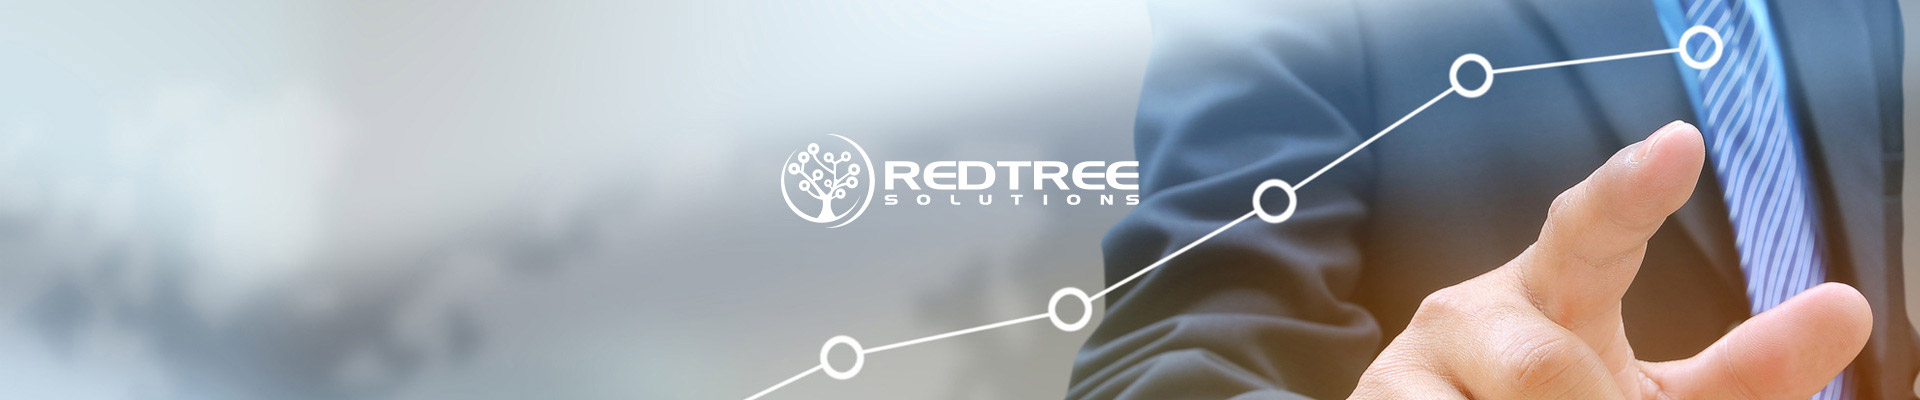 s_redtree_partners